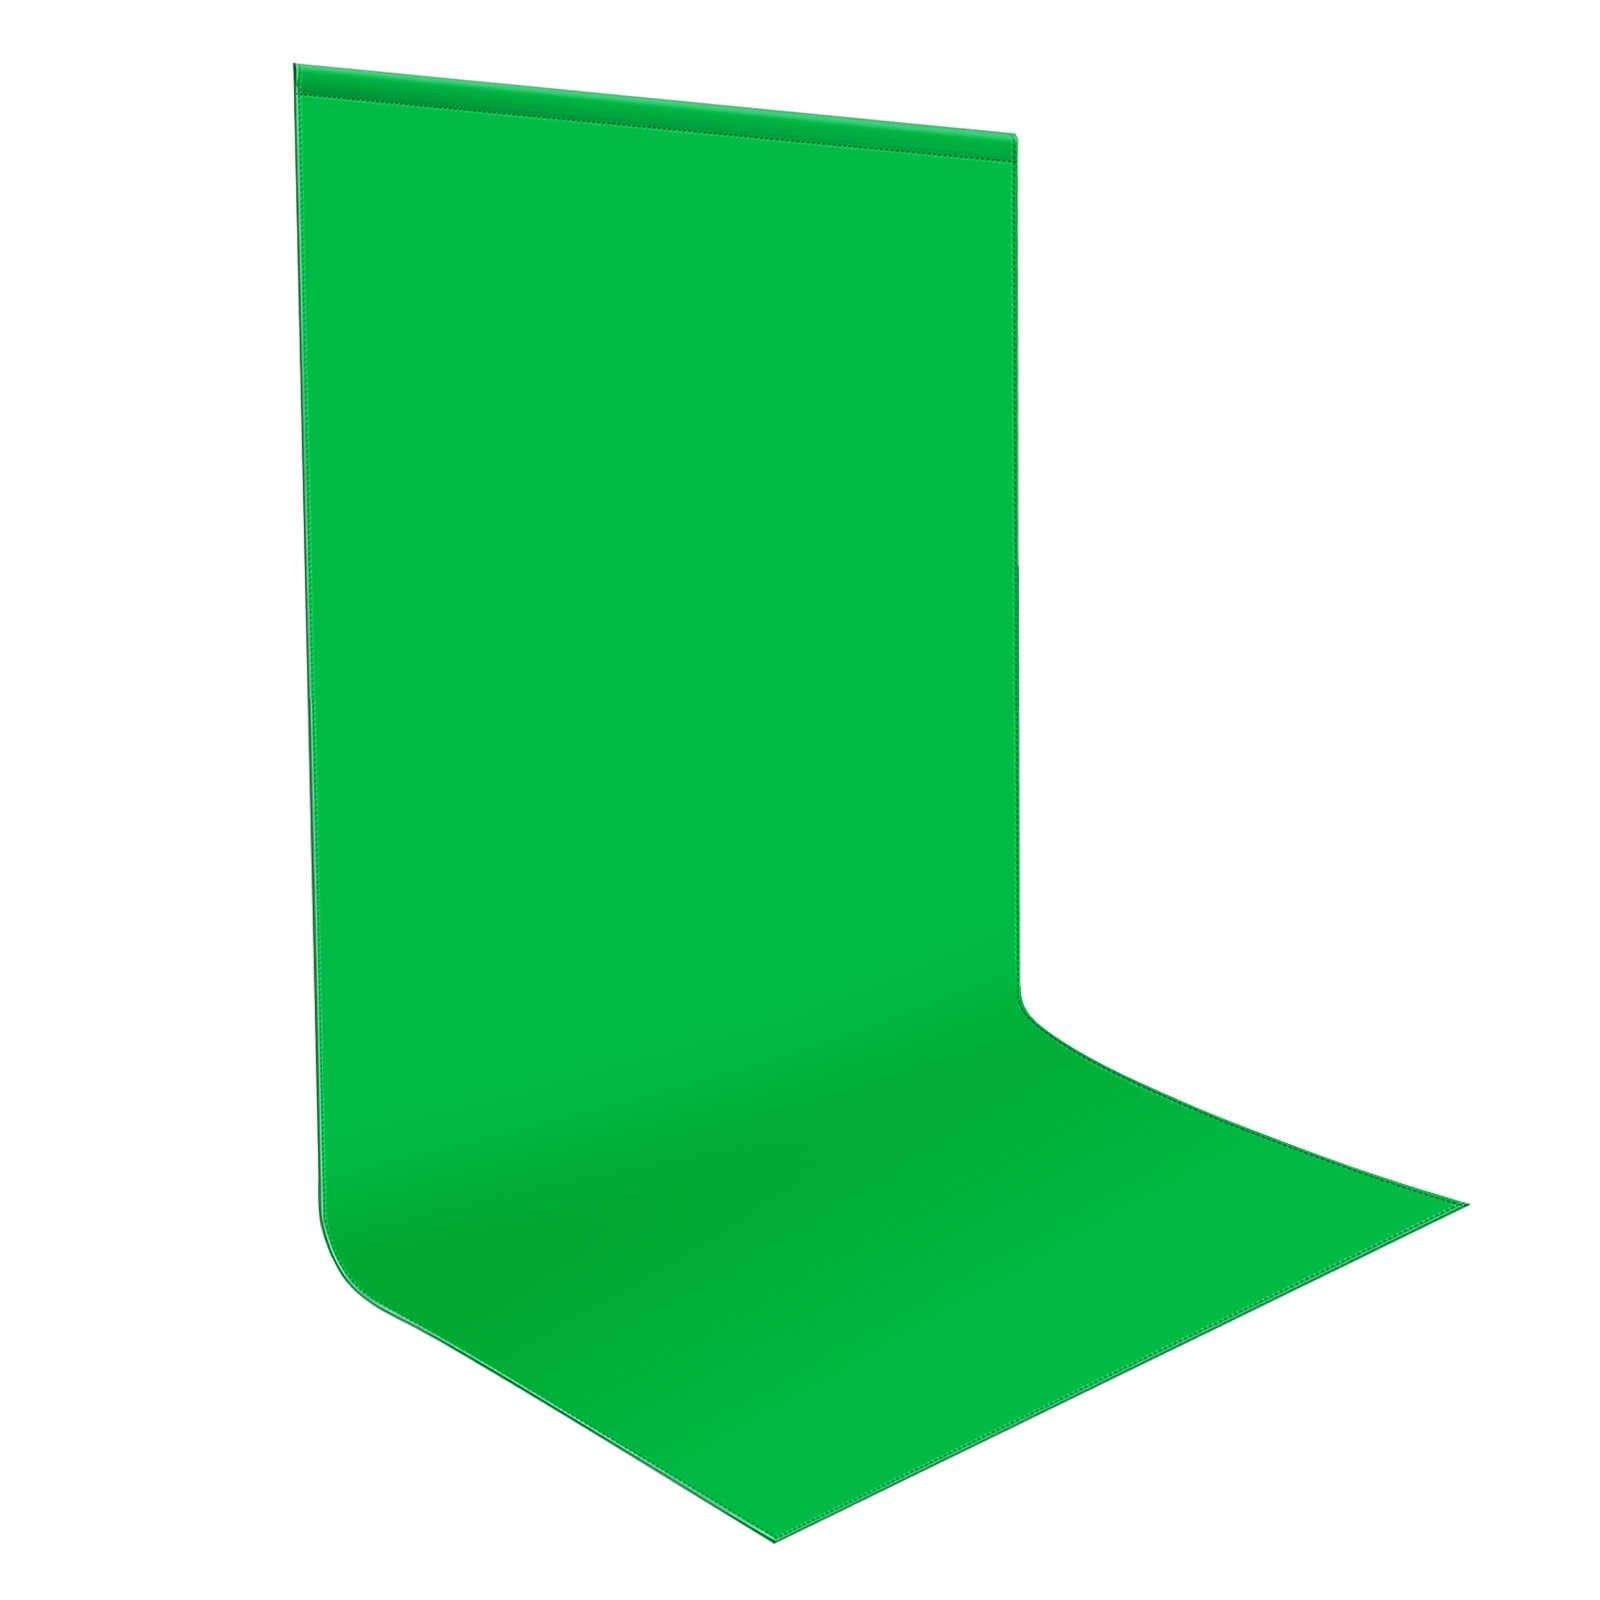 Solid Green Cotton Screen Chroma key Background Backdrop Studio Photo lighting